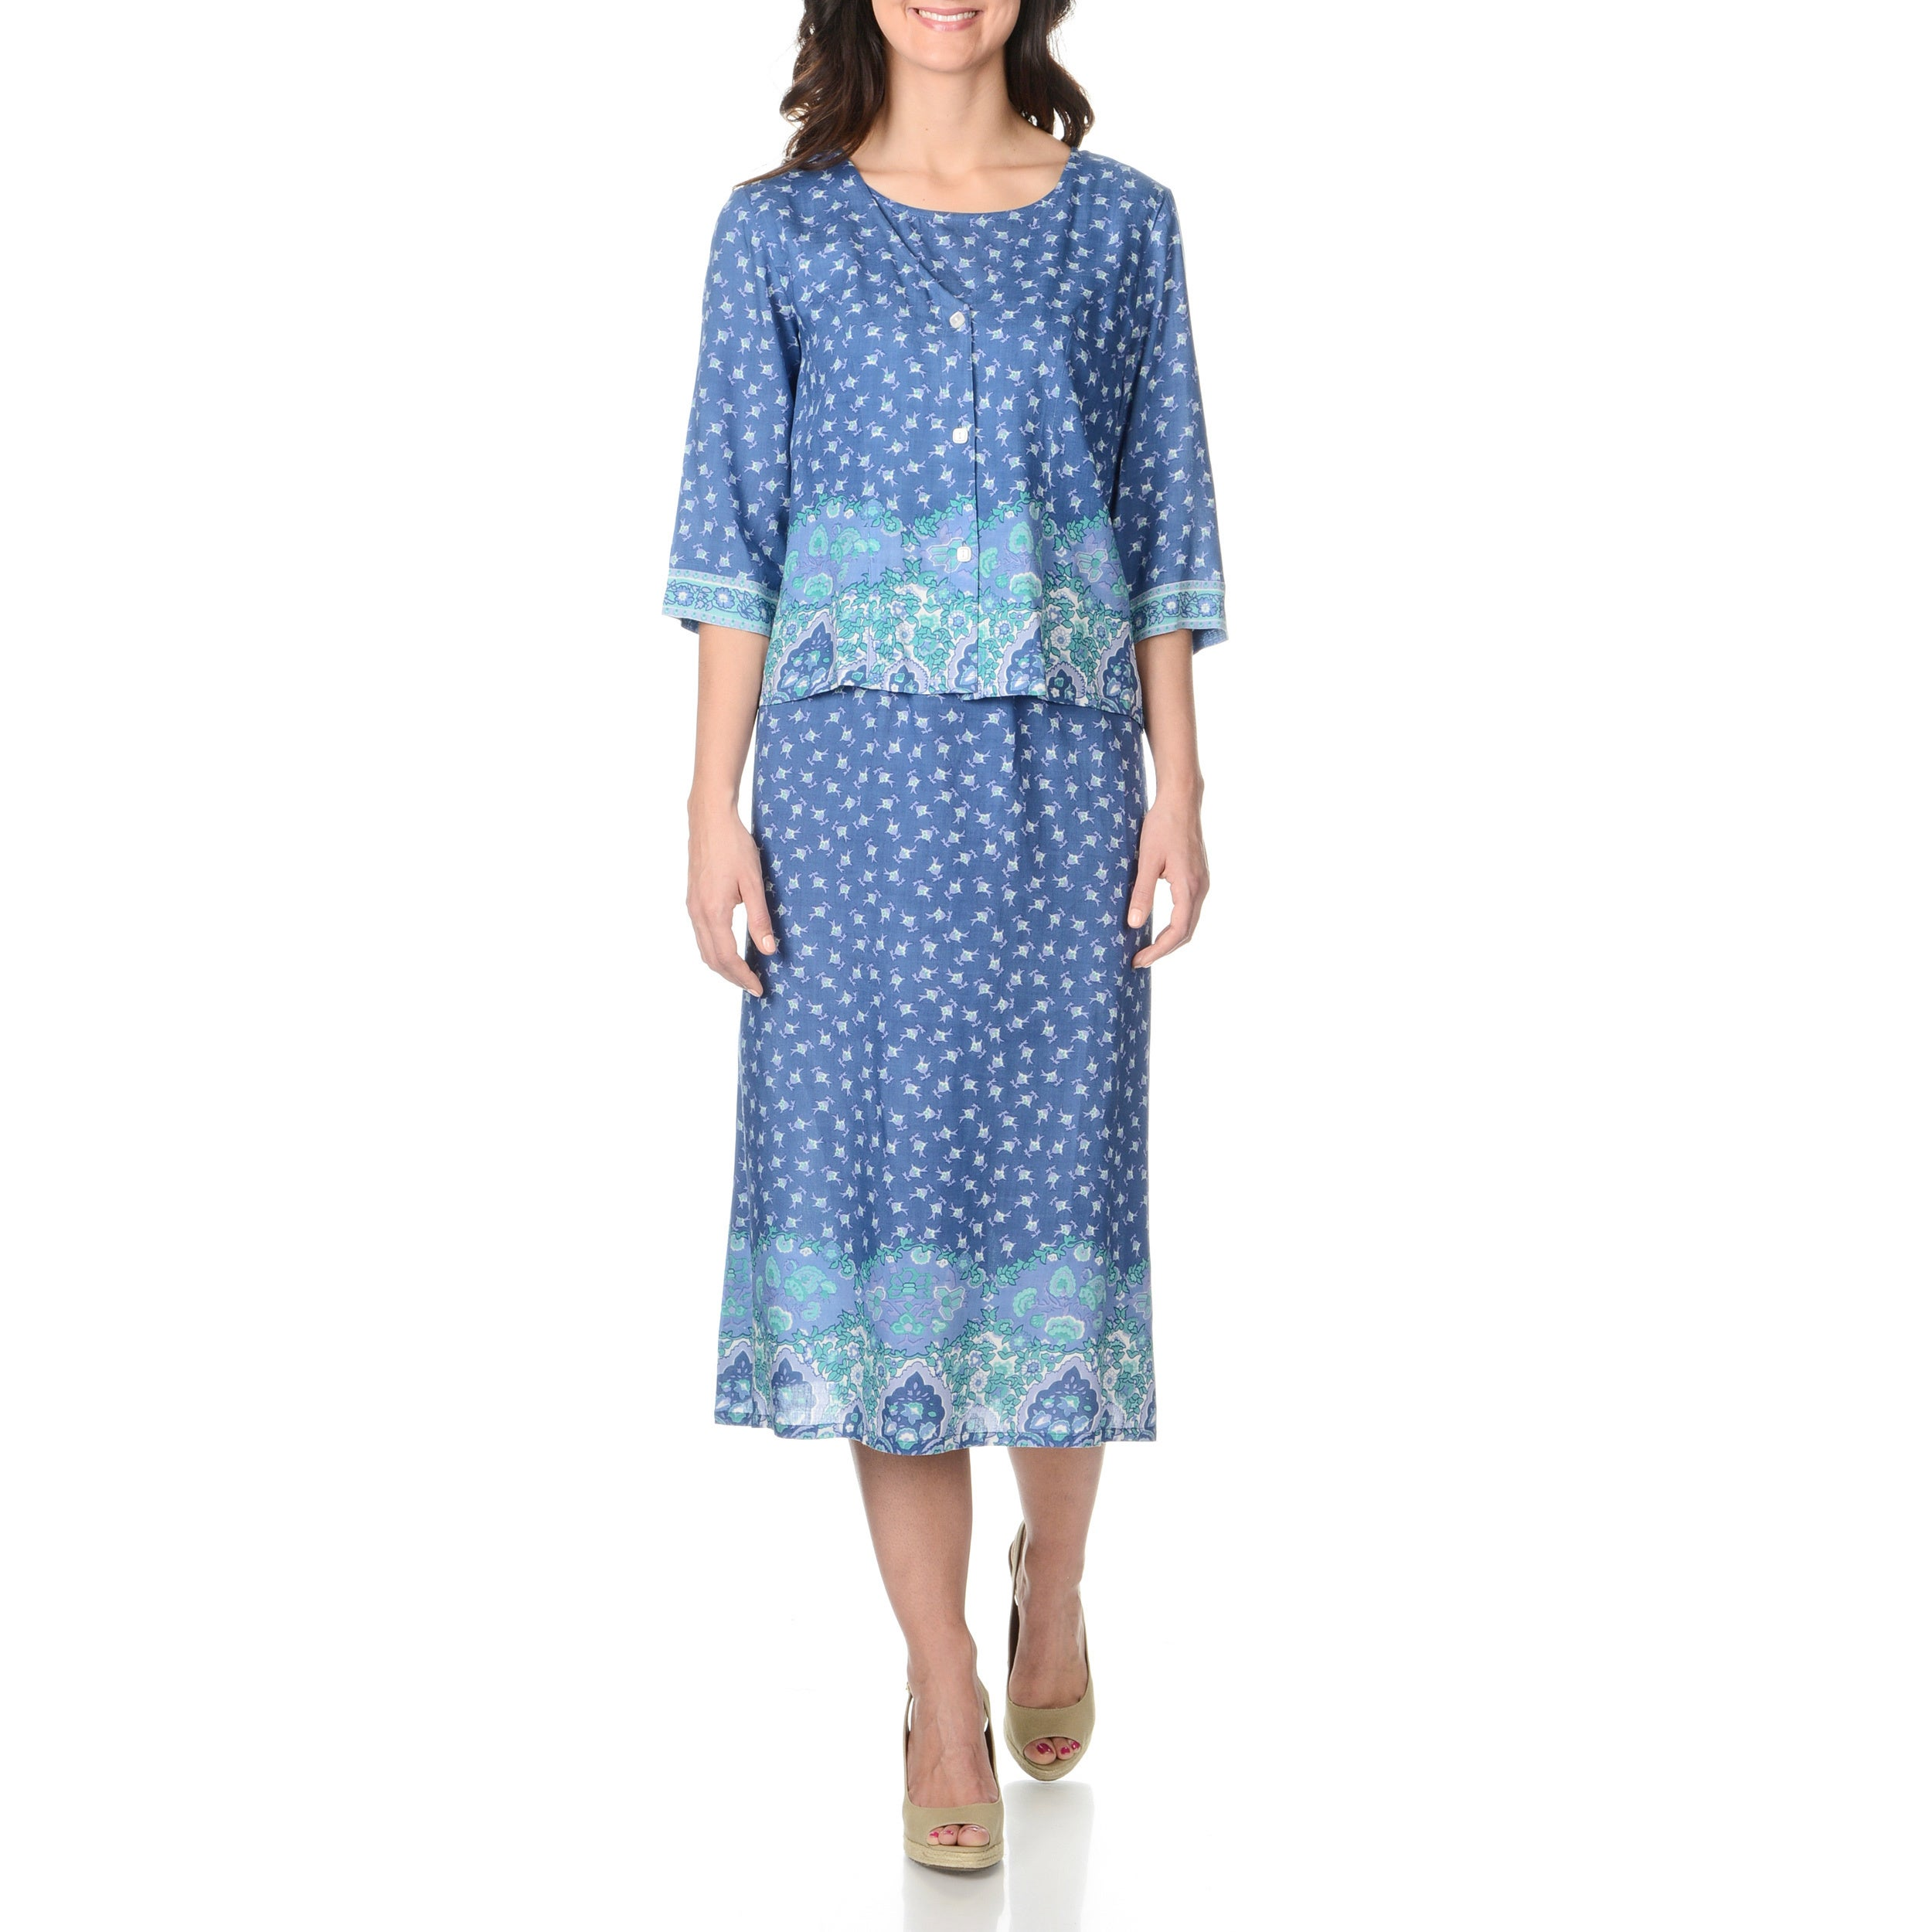 La Cera La Cera Women's Blue Floral Print Mock 2-piece Long Dress